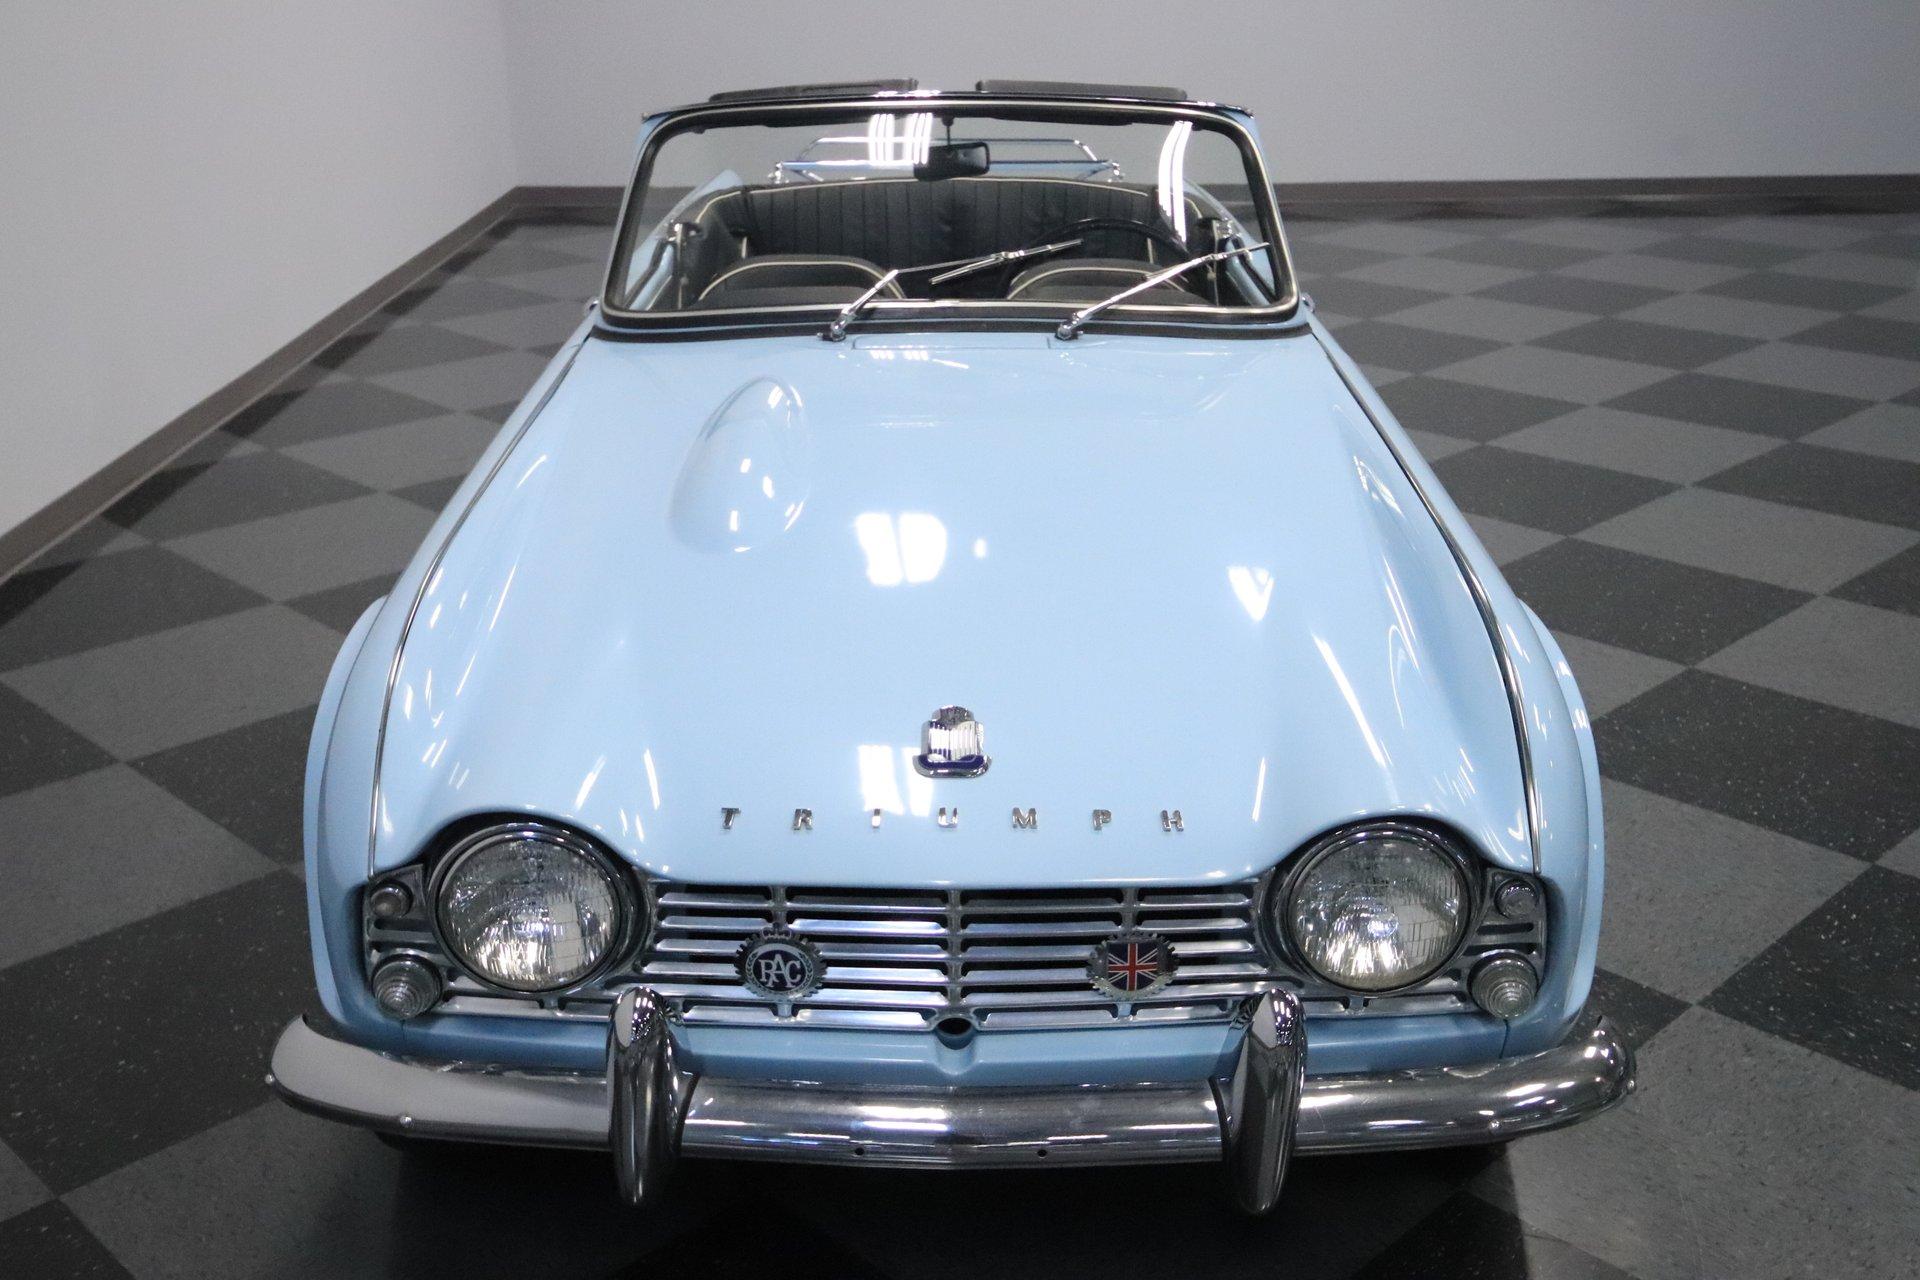 1962 Triumph Tr4 Streetside Classics The Nations Trusted